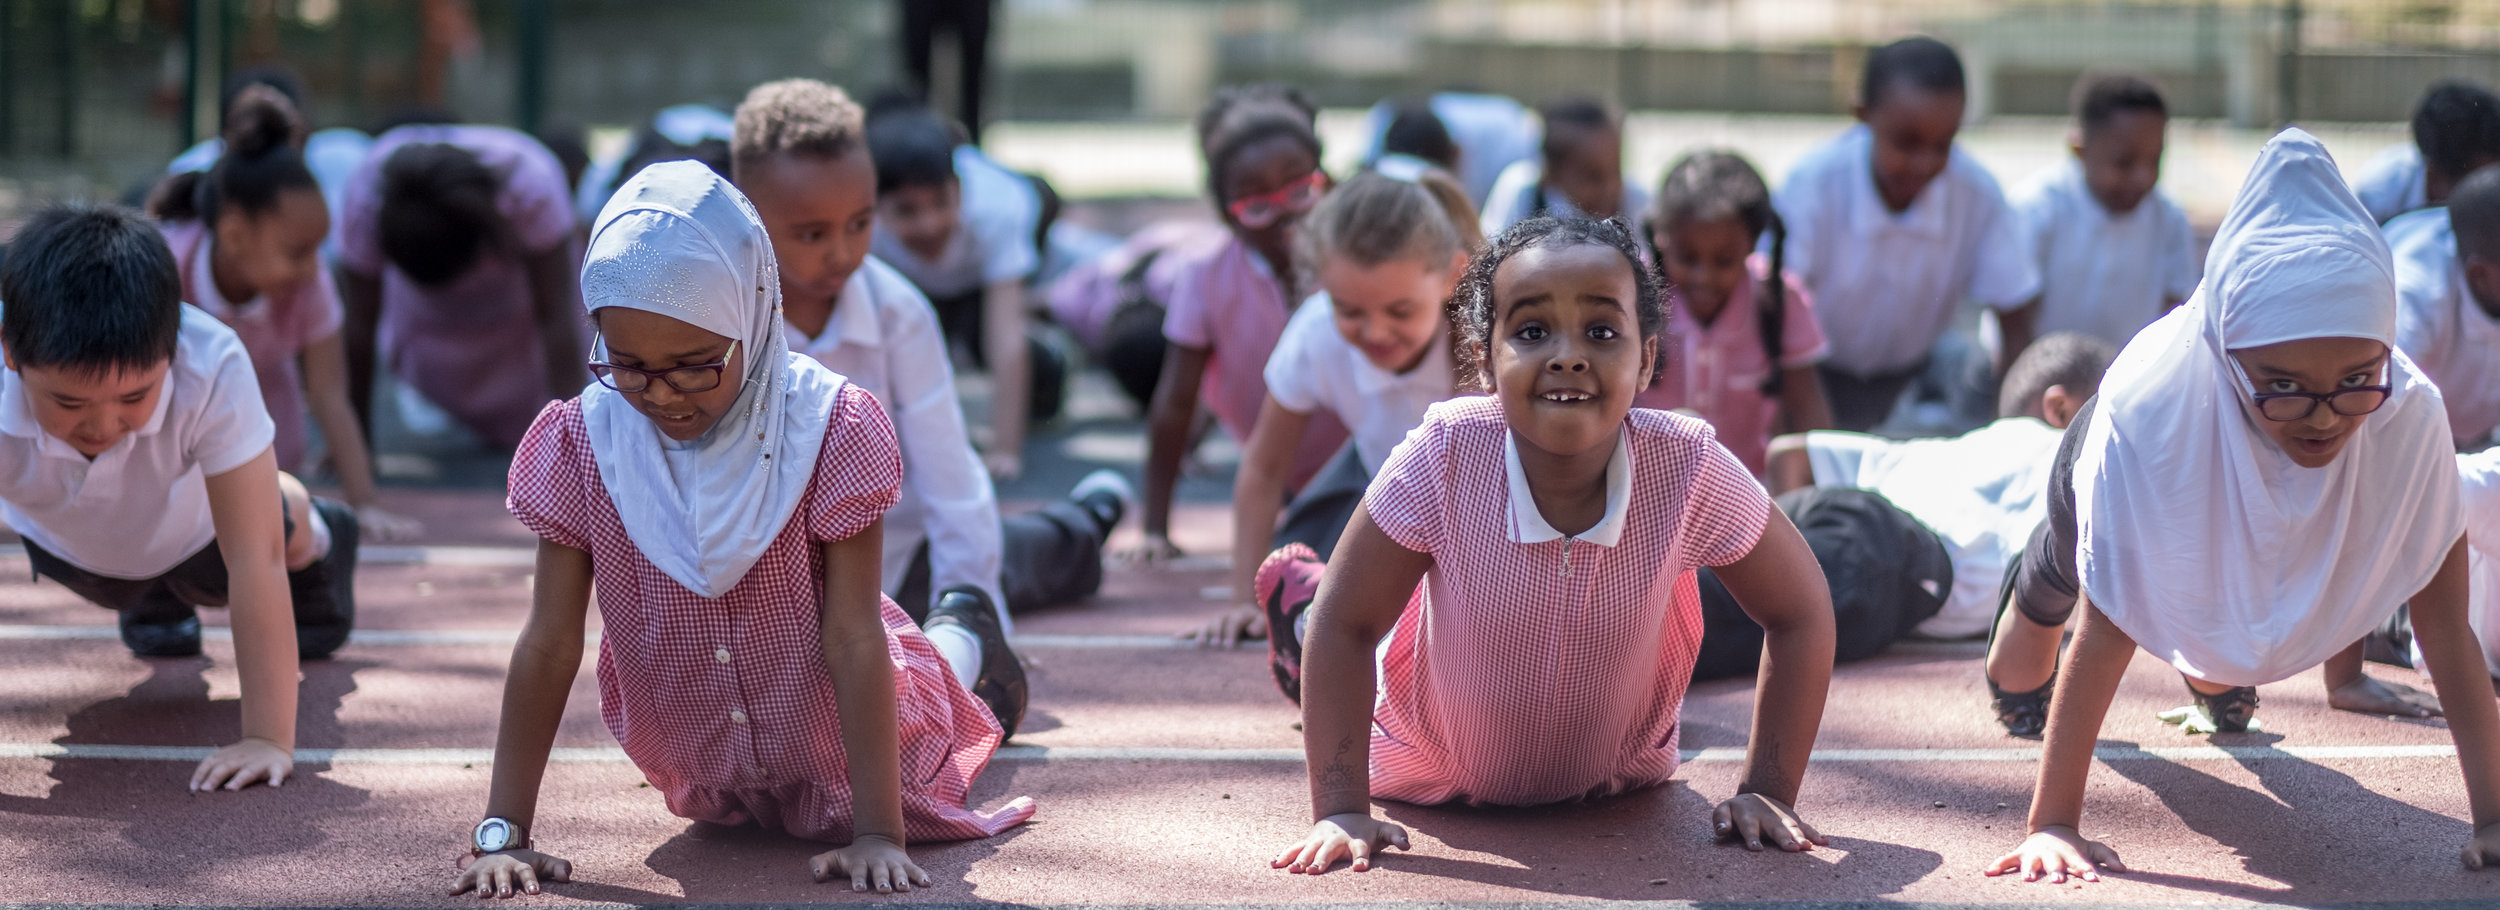 Yasmin Miller- Team GB Athlete visits Cardwell Primary School